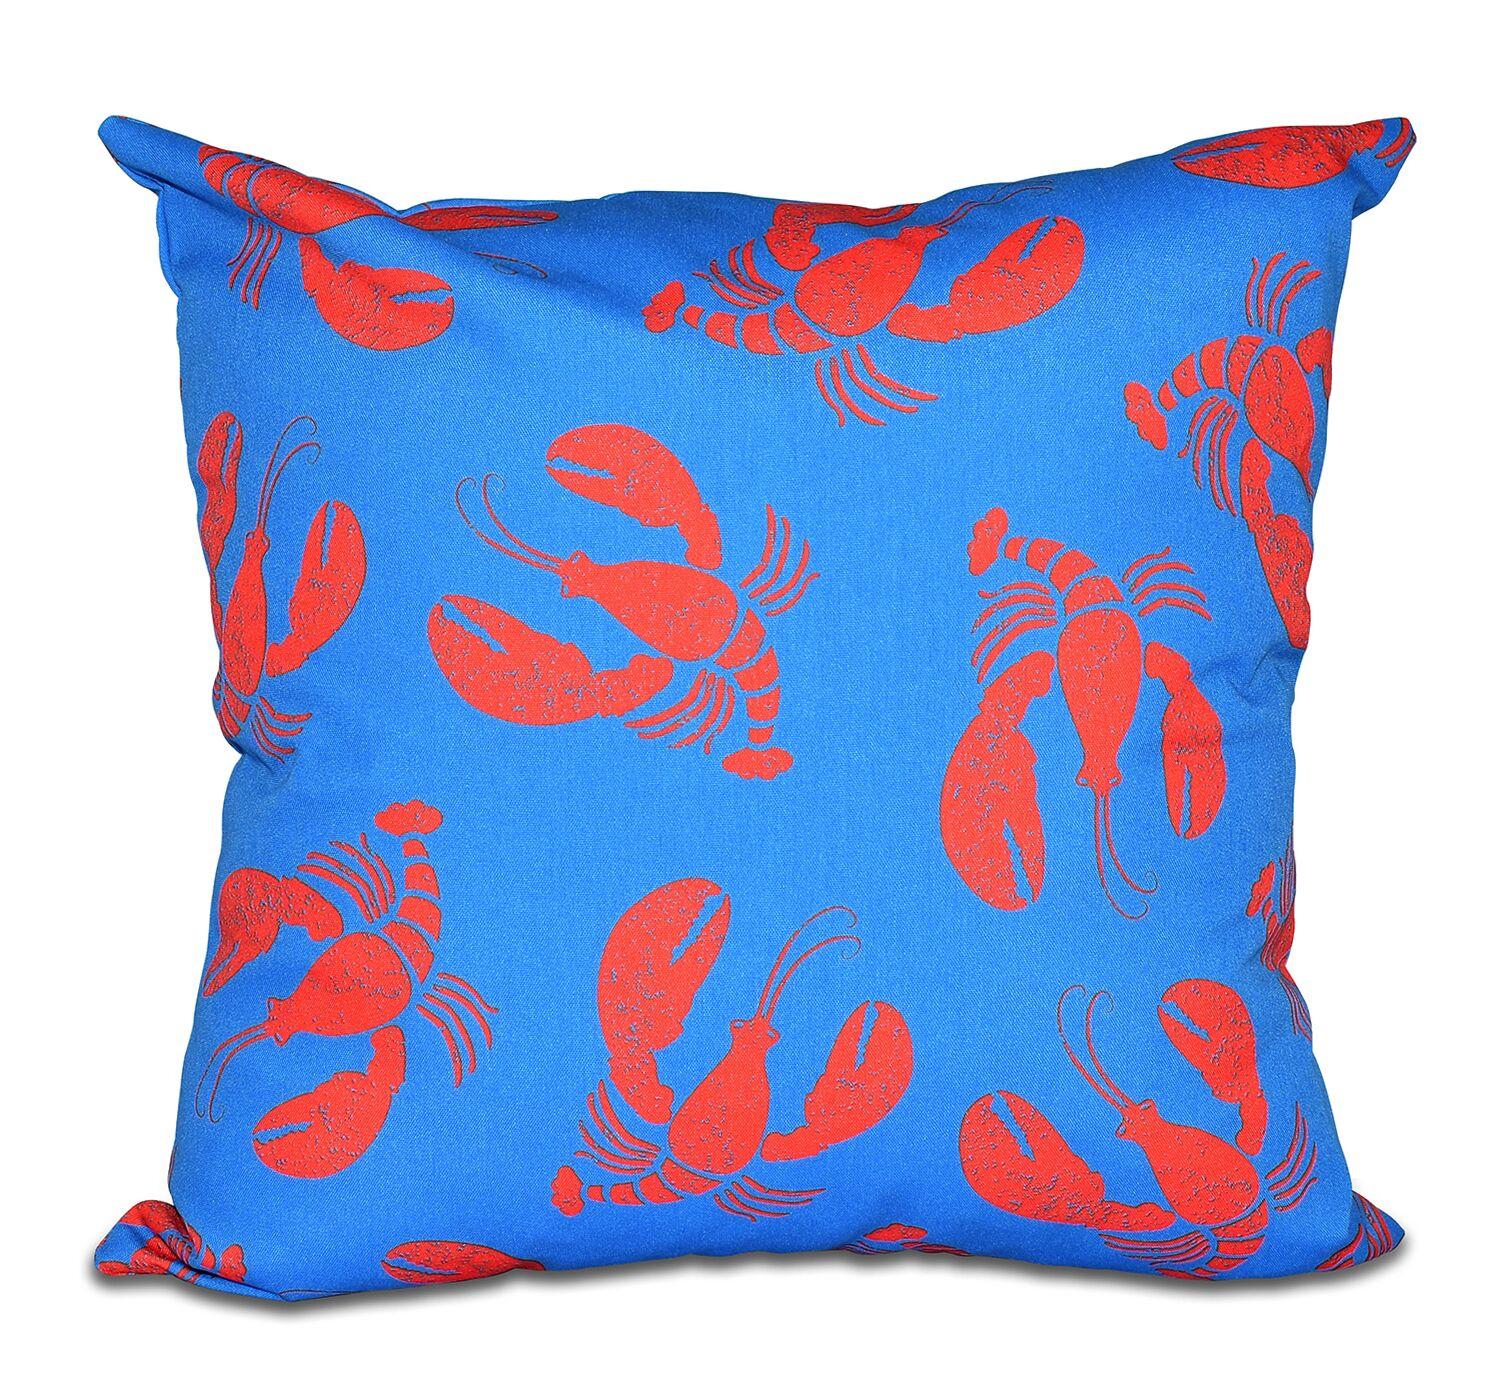 Bridgeport Lobster Fest Coastal Throw Pillow Color: Taupe/Beige, Size: 20